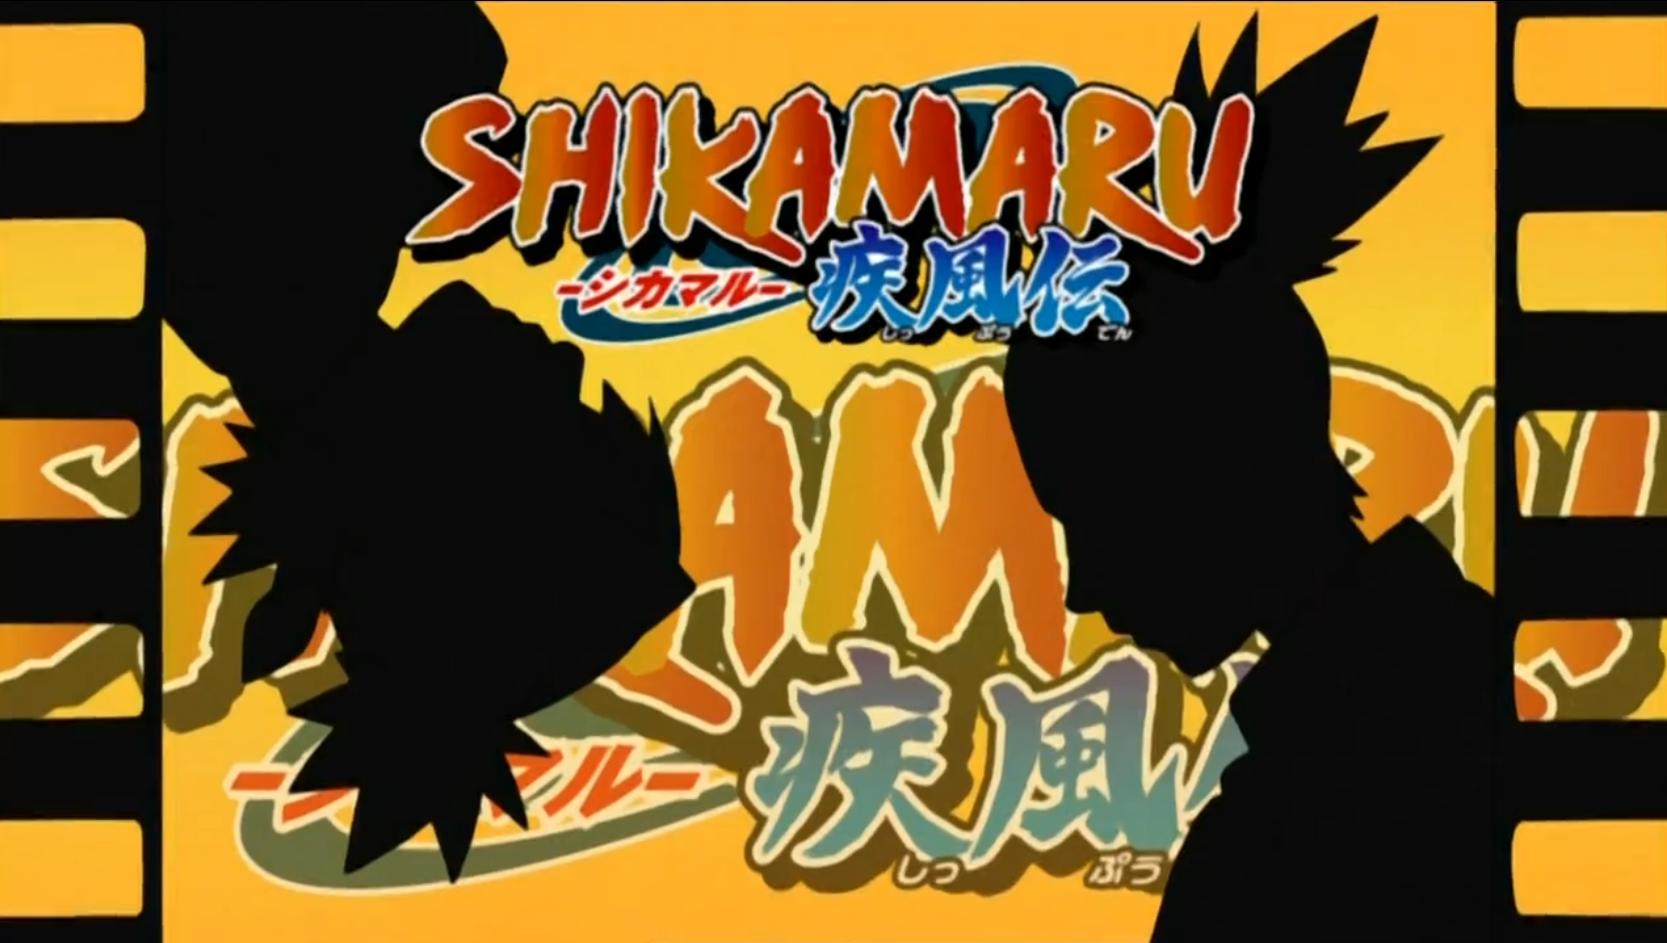 Naruto dating sim shikamaru ending friendship